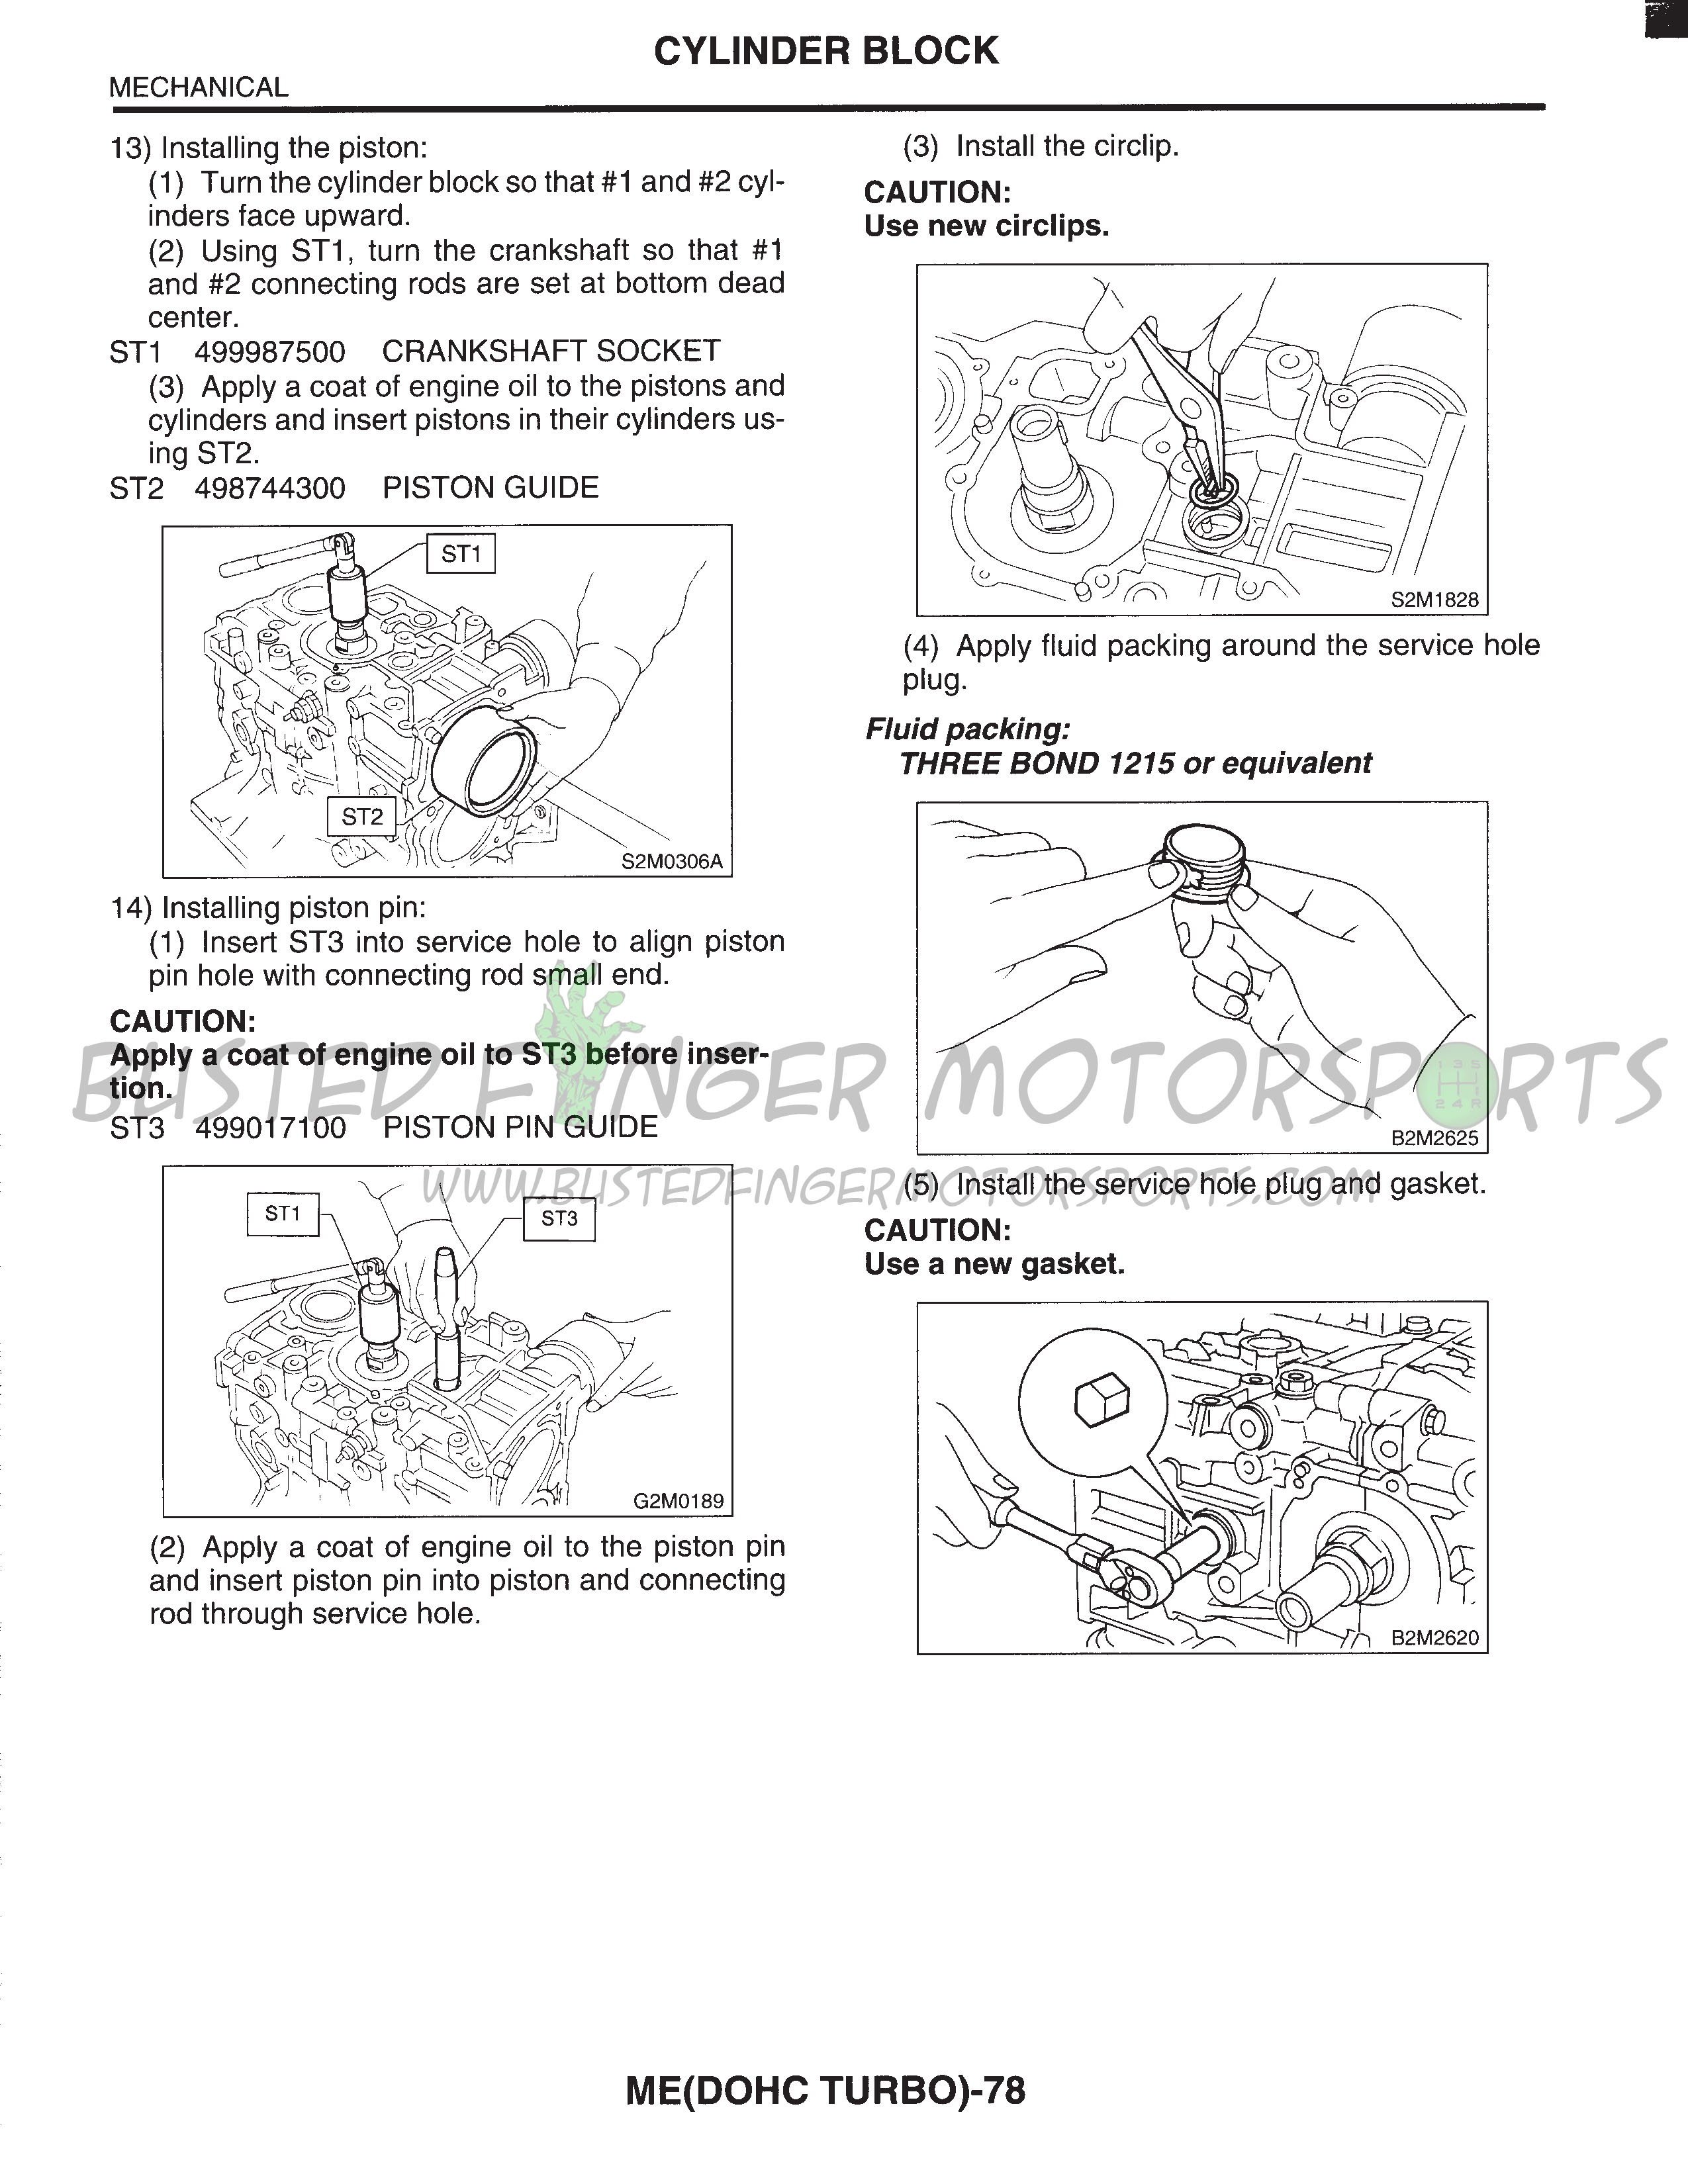 Busted Finger Motorsports EJ205 Engine Block Cheat Sheets – Diagram Of An Engine Ej205